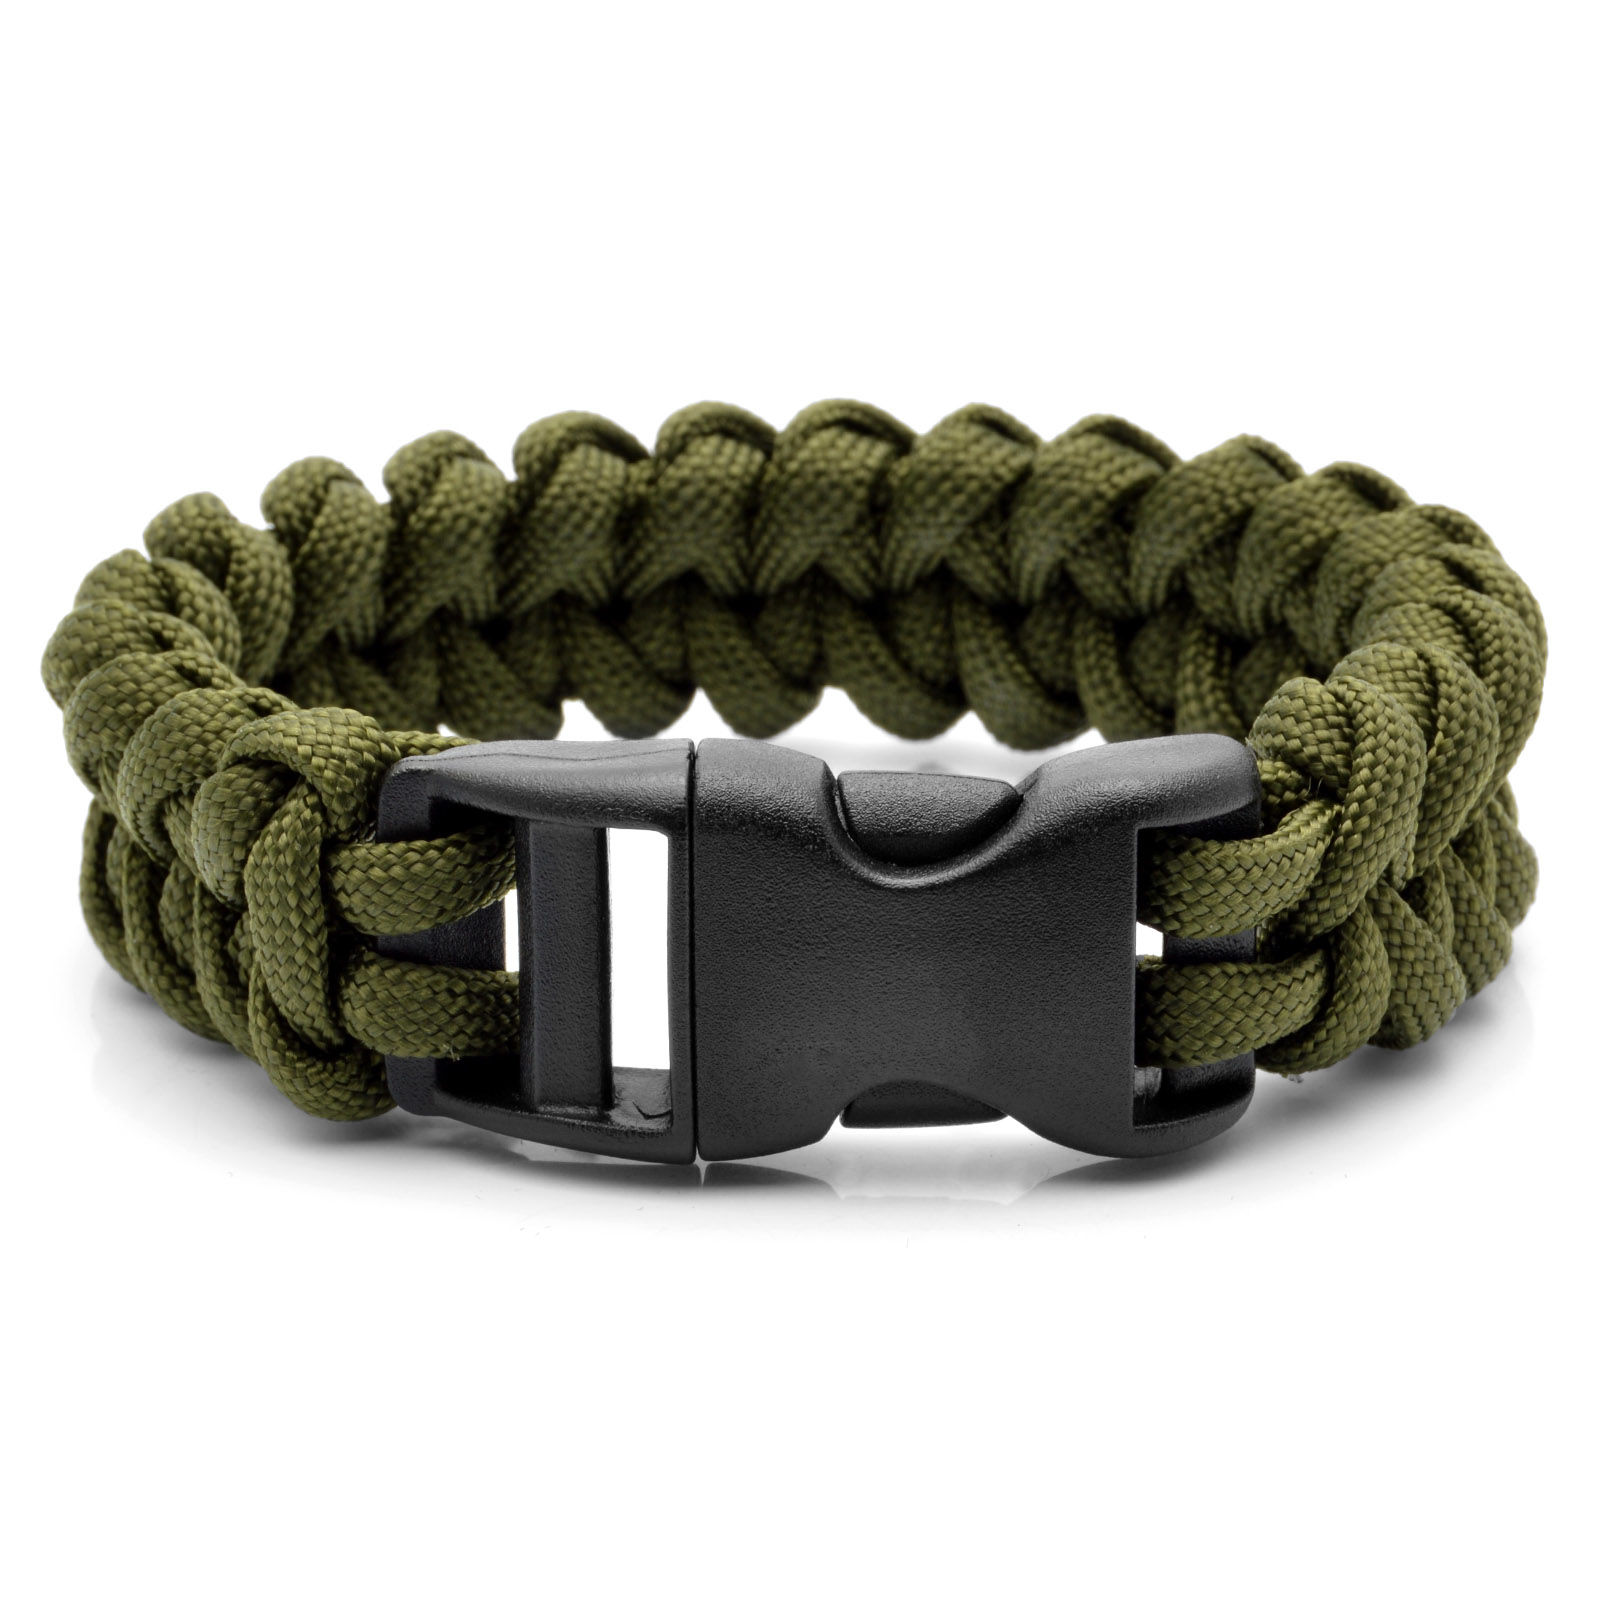 Green and Tan Paracord Bracelet Trendhim 1M4NPh